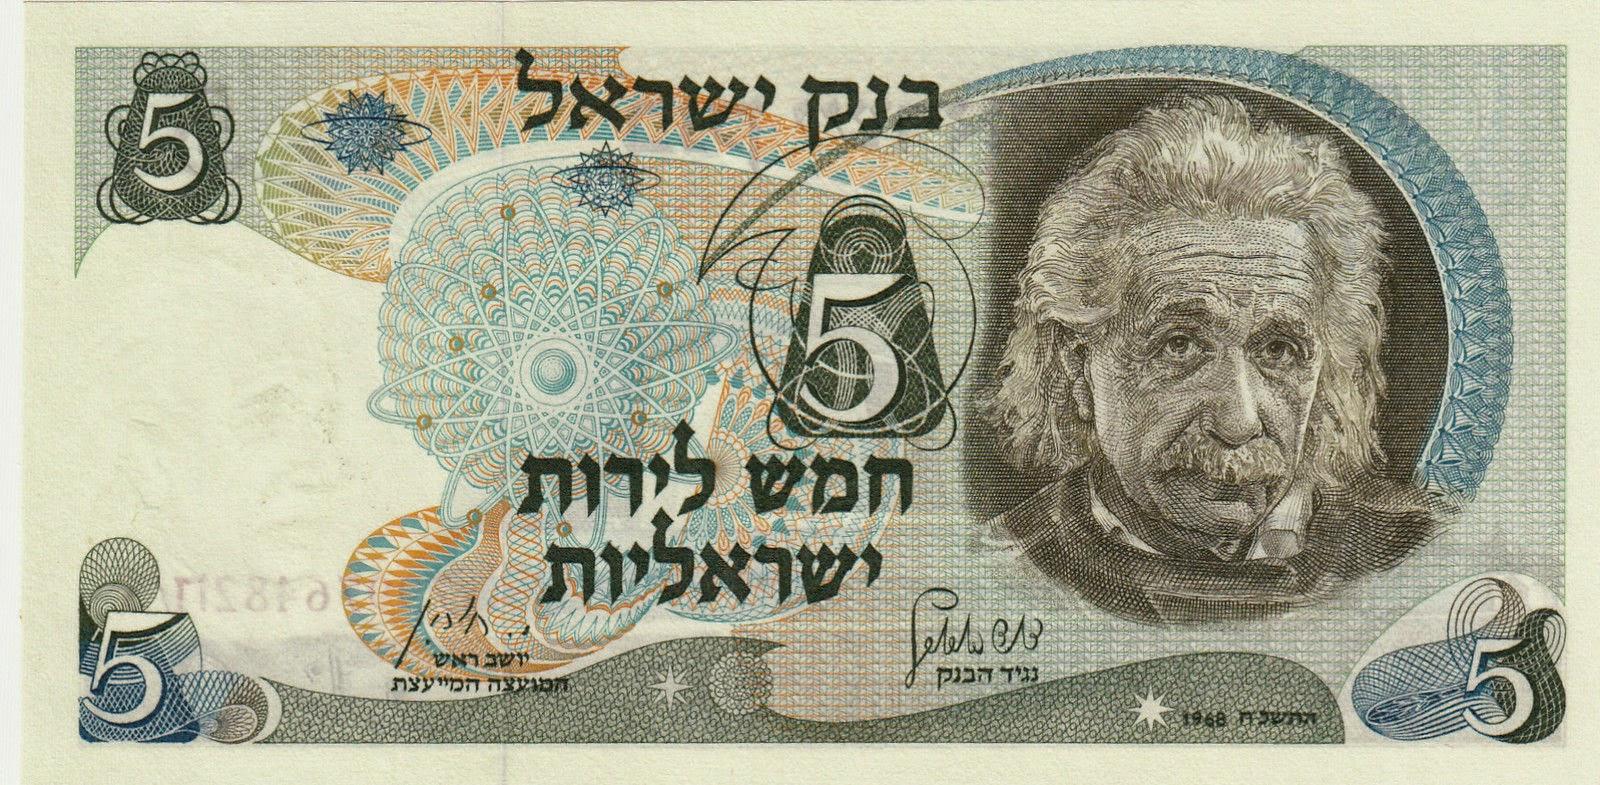 100 israeli money - London time sydney time